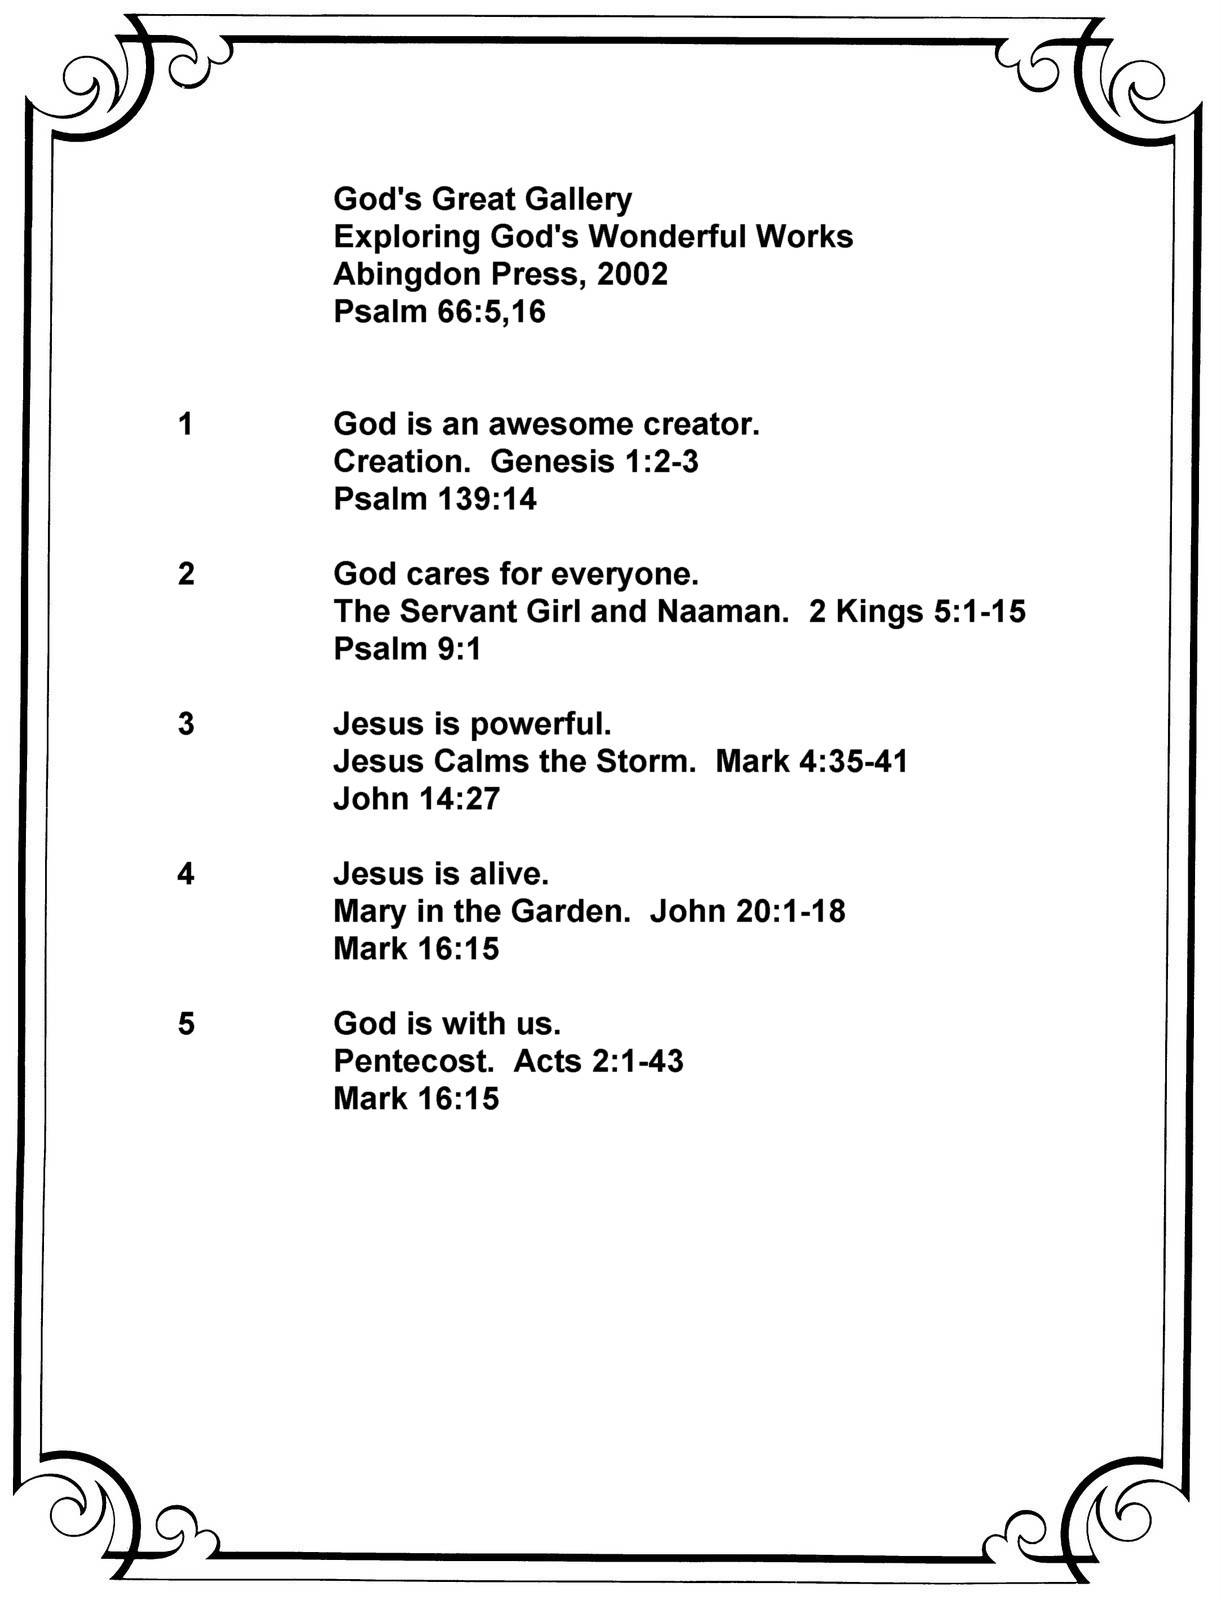 God's Great Gallery Summary